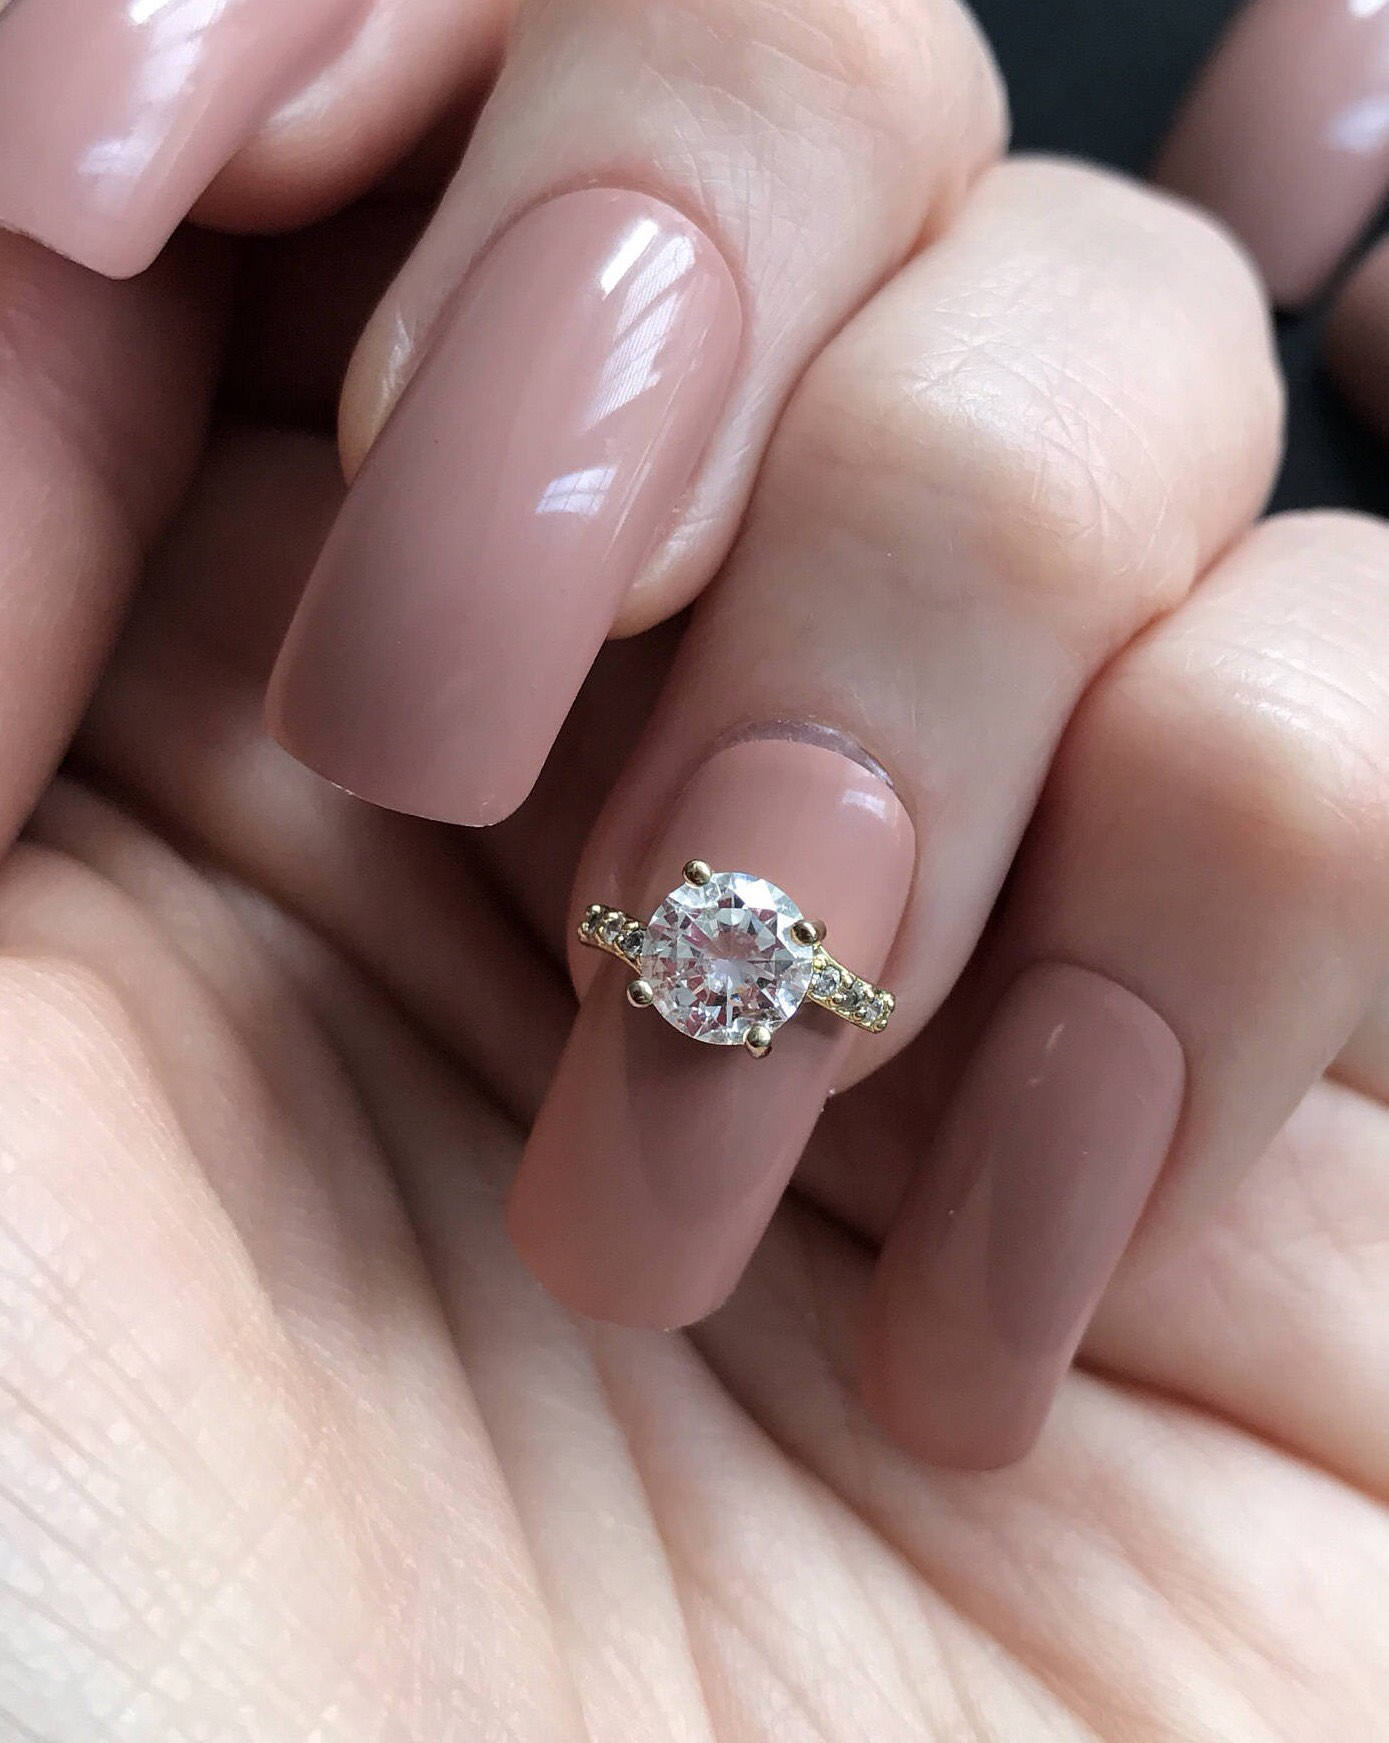 Stunning gold Zircon nail jewel diamond ring style nail art band